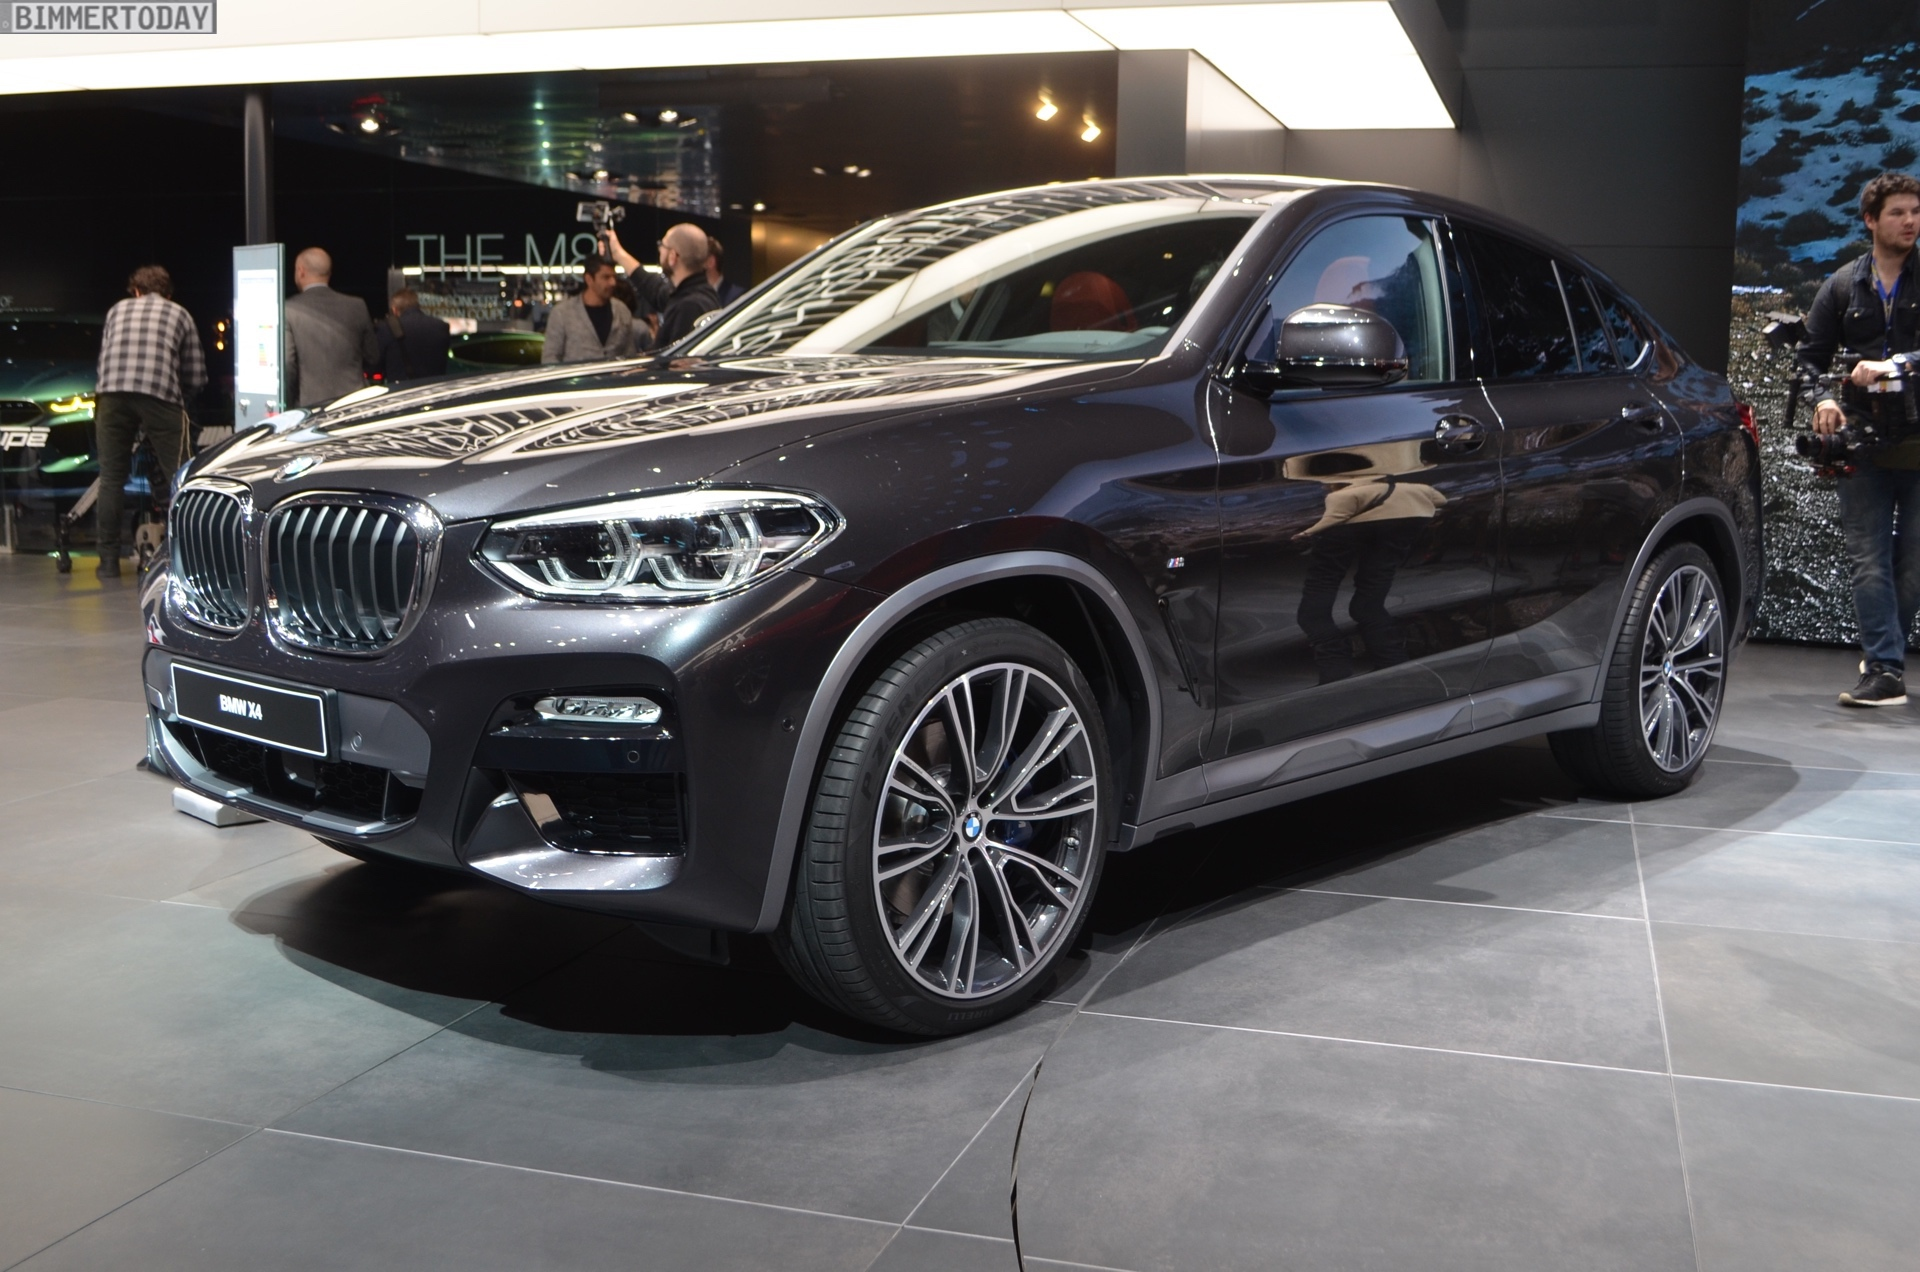 Genf 2018 Live Fotos BMW X4 G02 M Sport X In Sophistograu